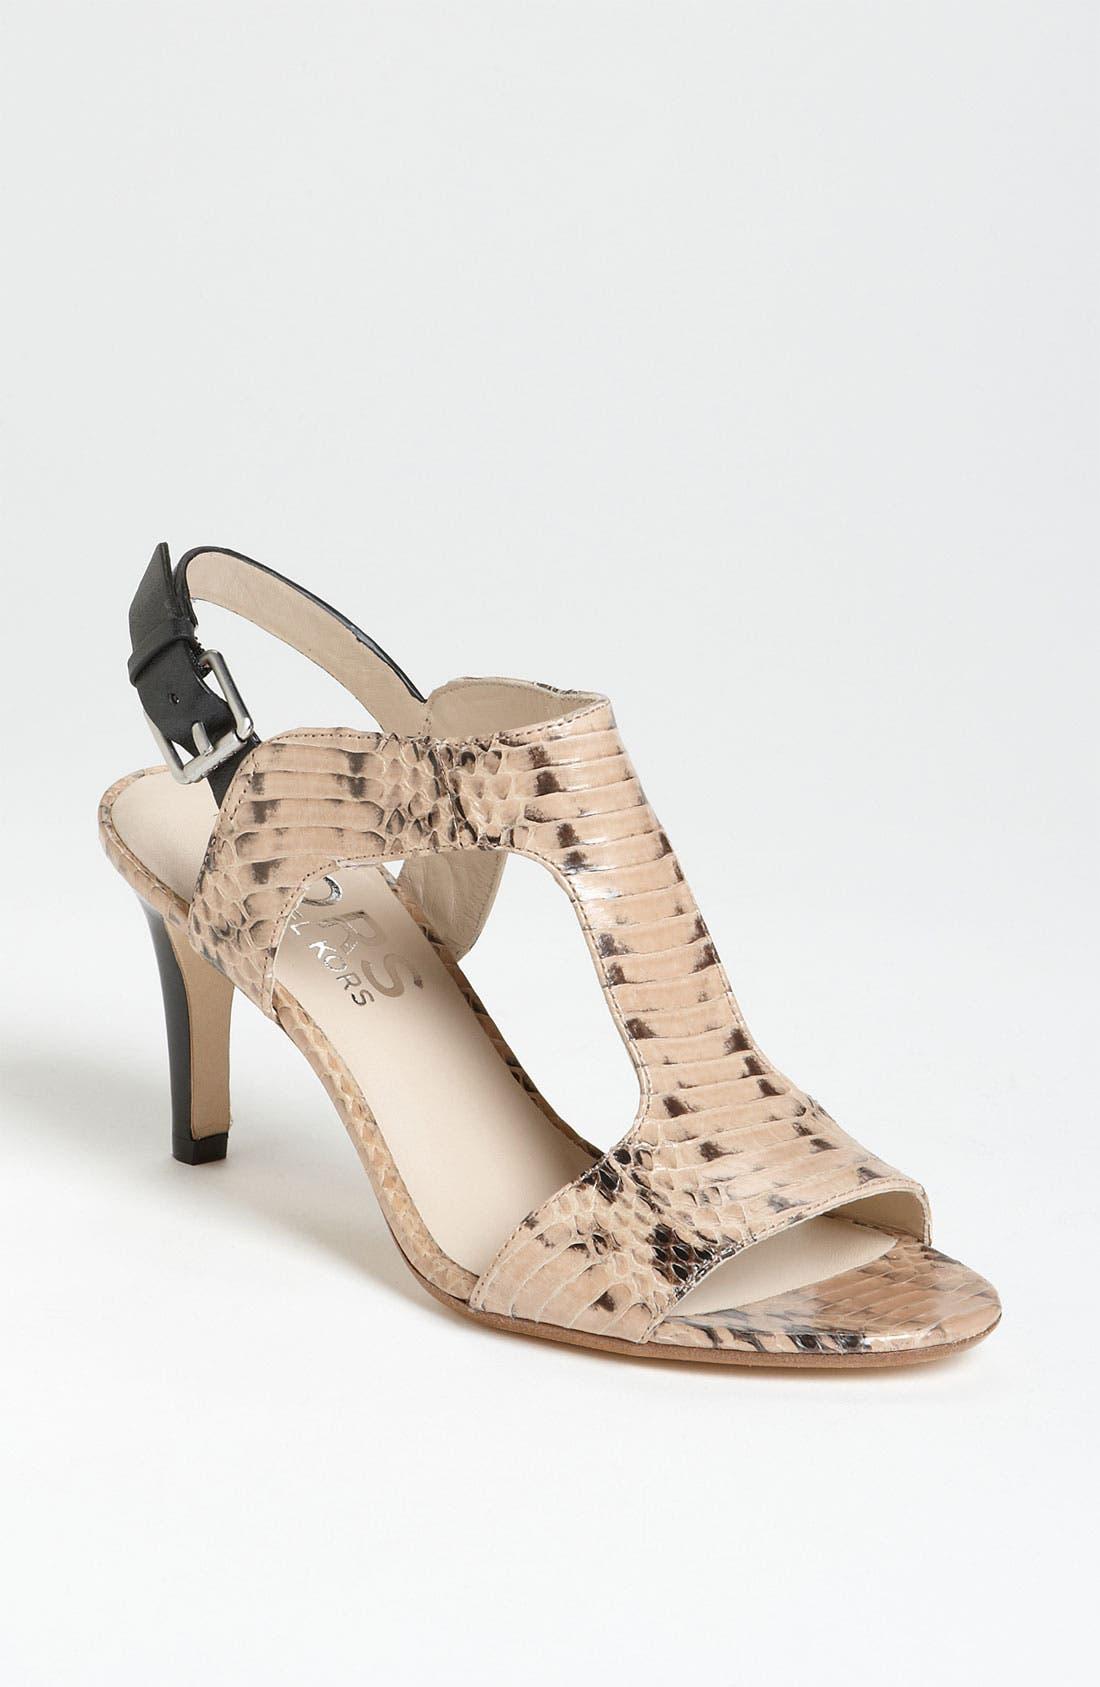 Alternate Image 1 Selected - KORS Michael Kors 'Xyla' Sandal